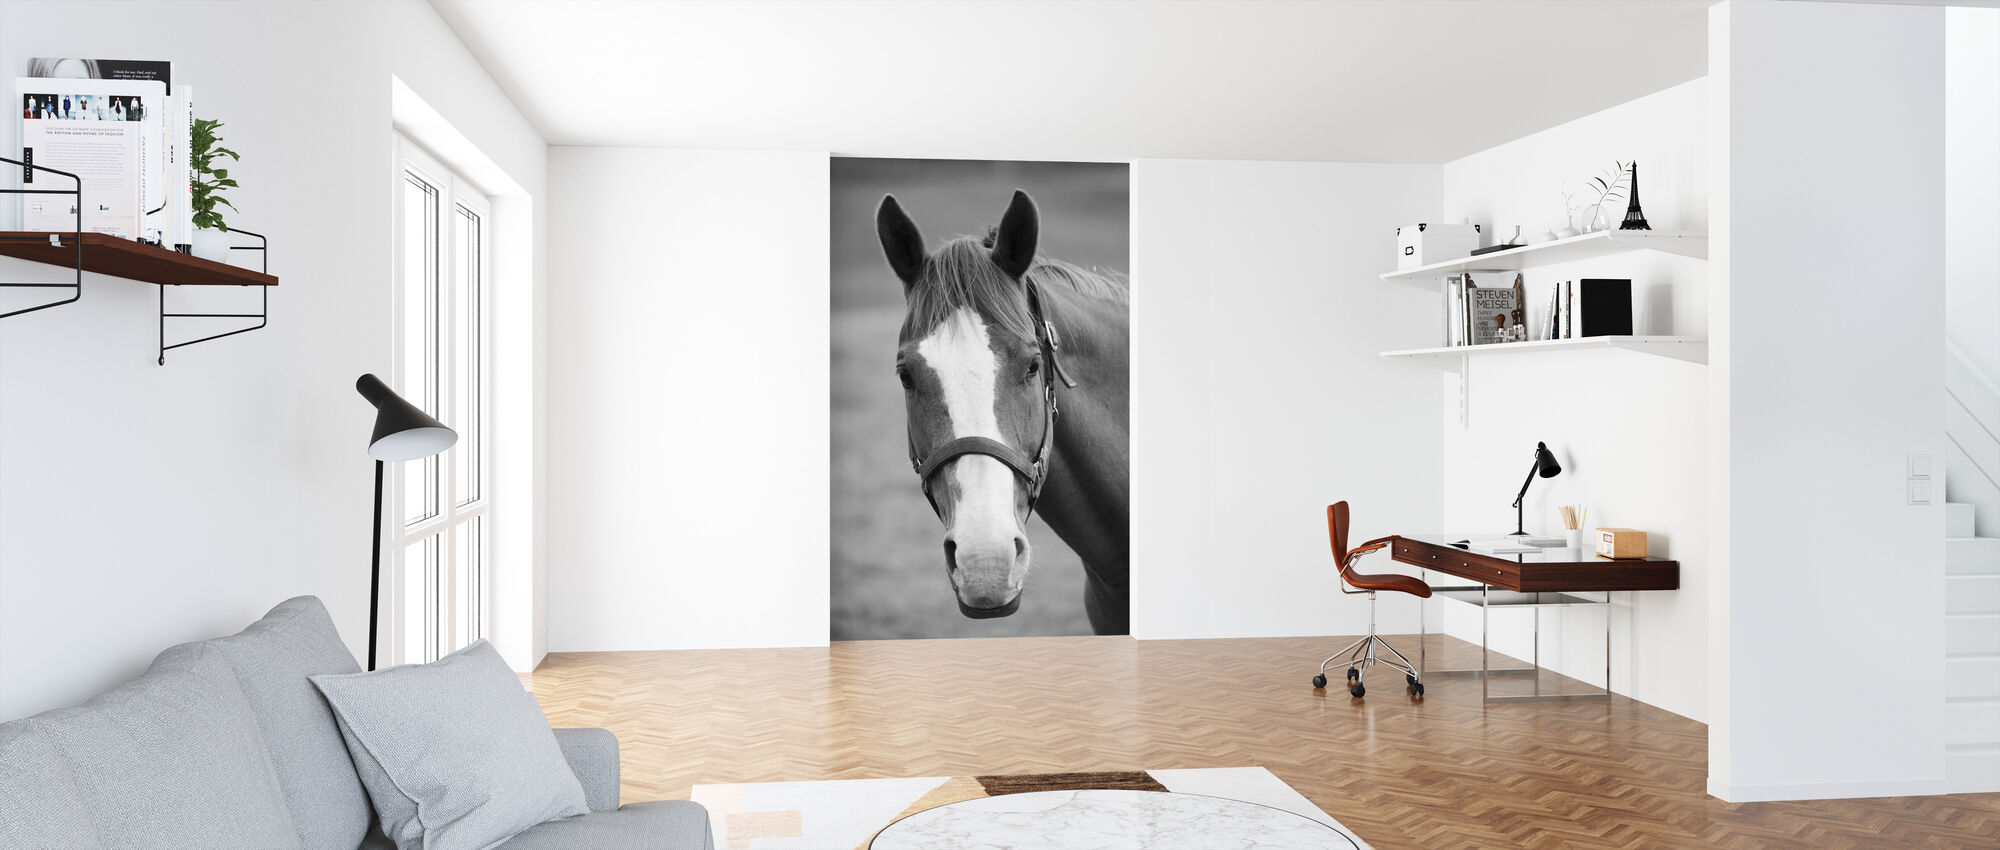 Sweet Horse - Wallpaper - Office